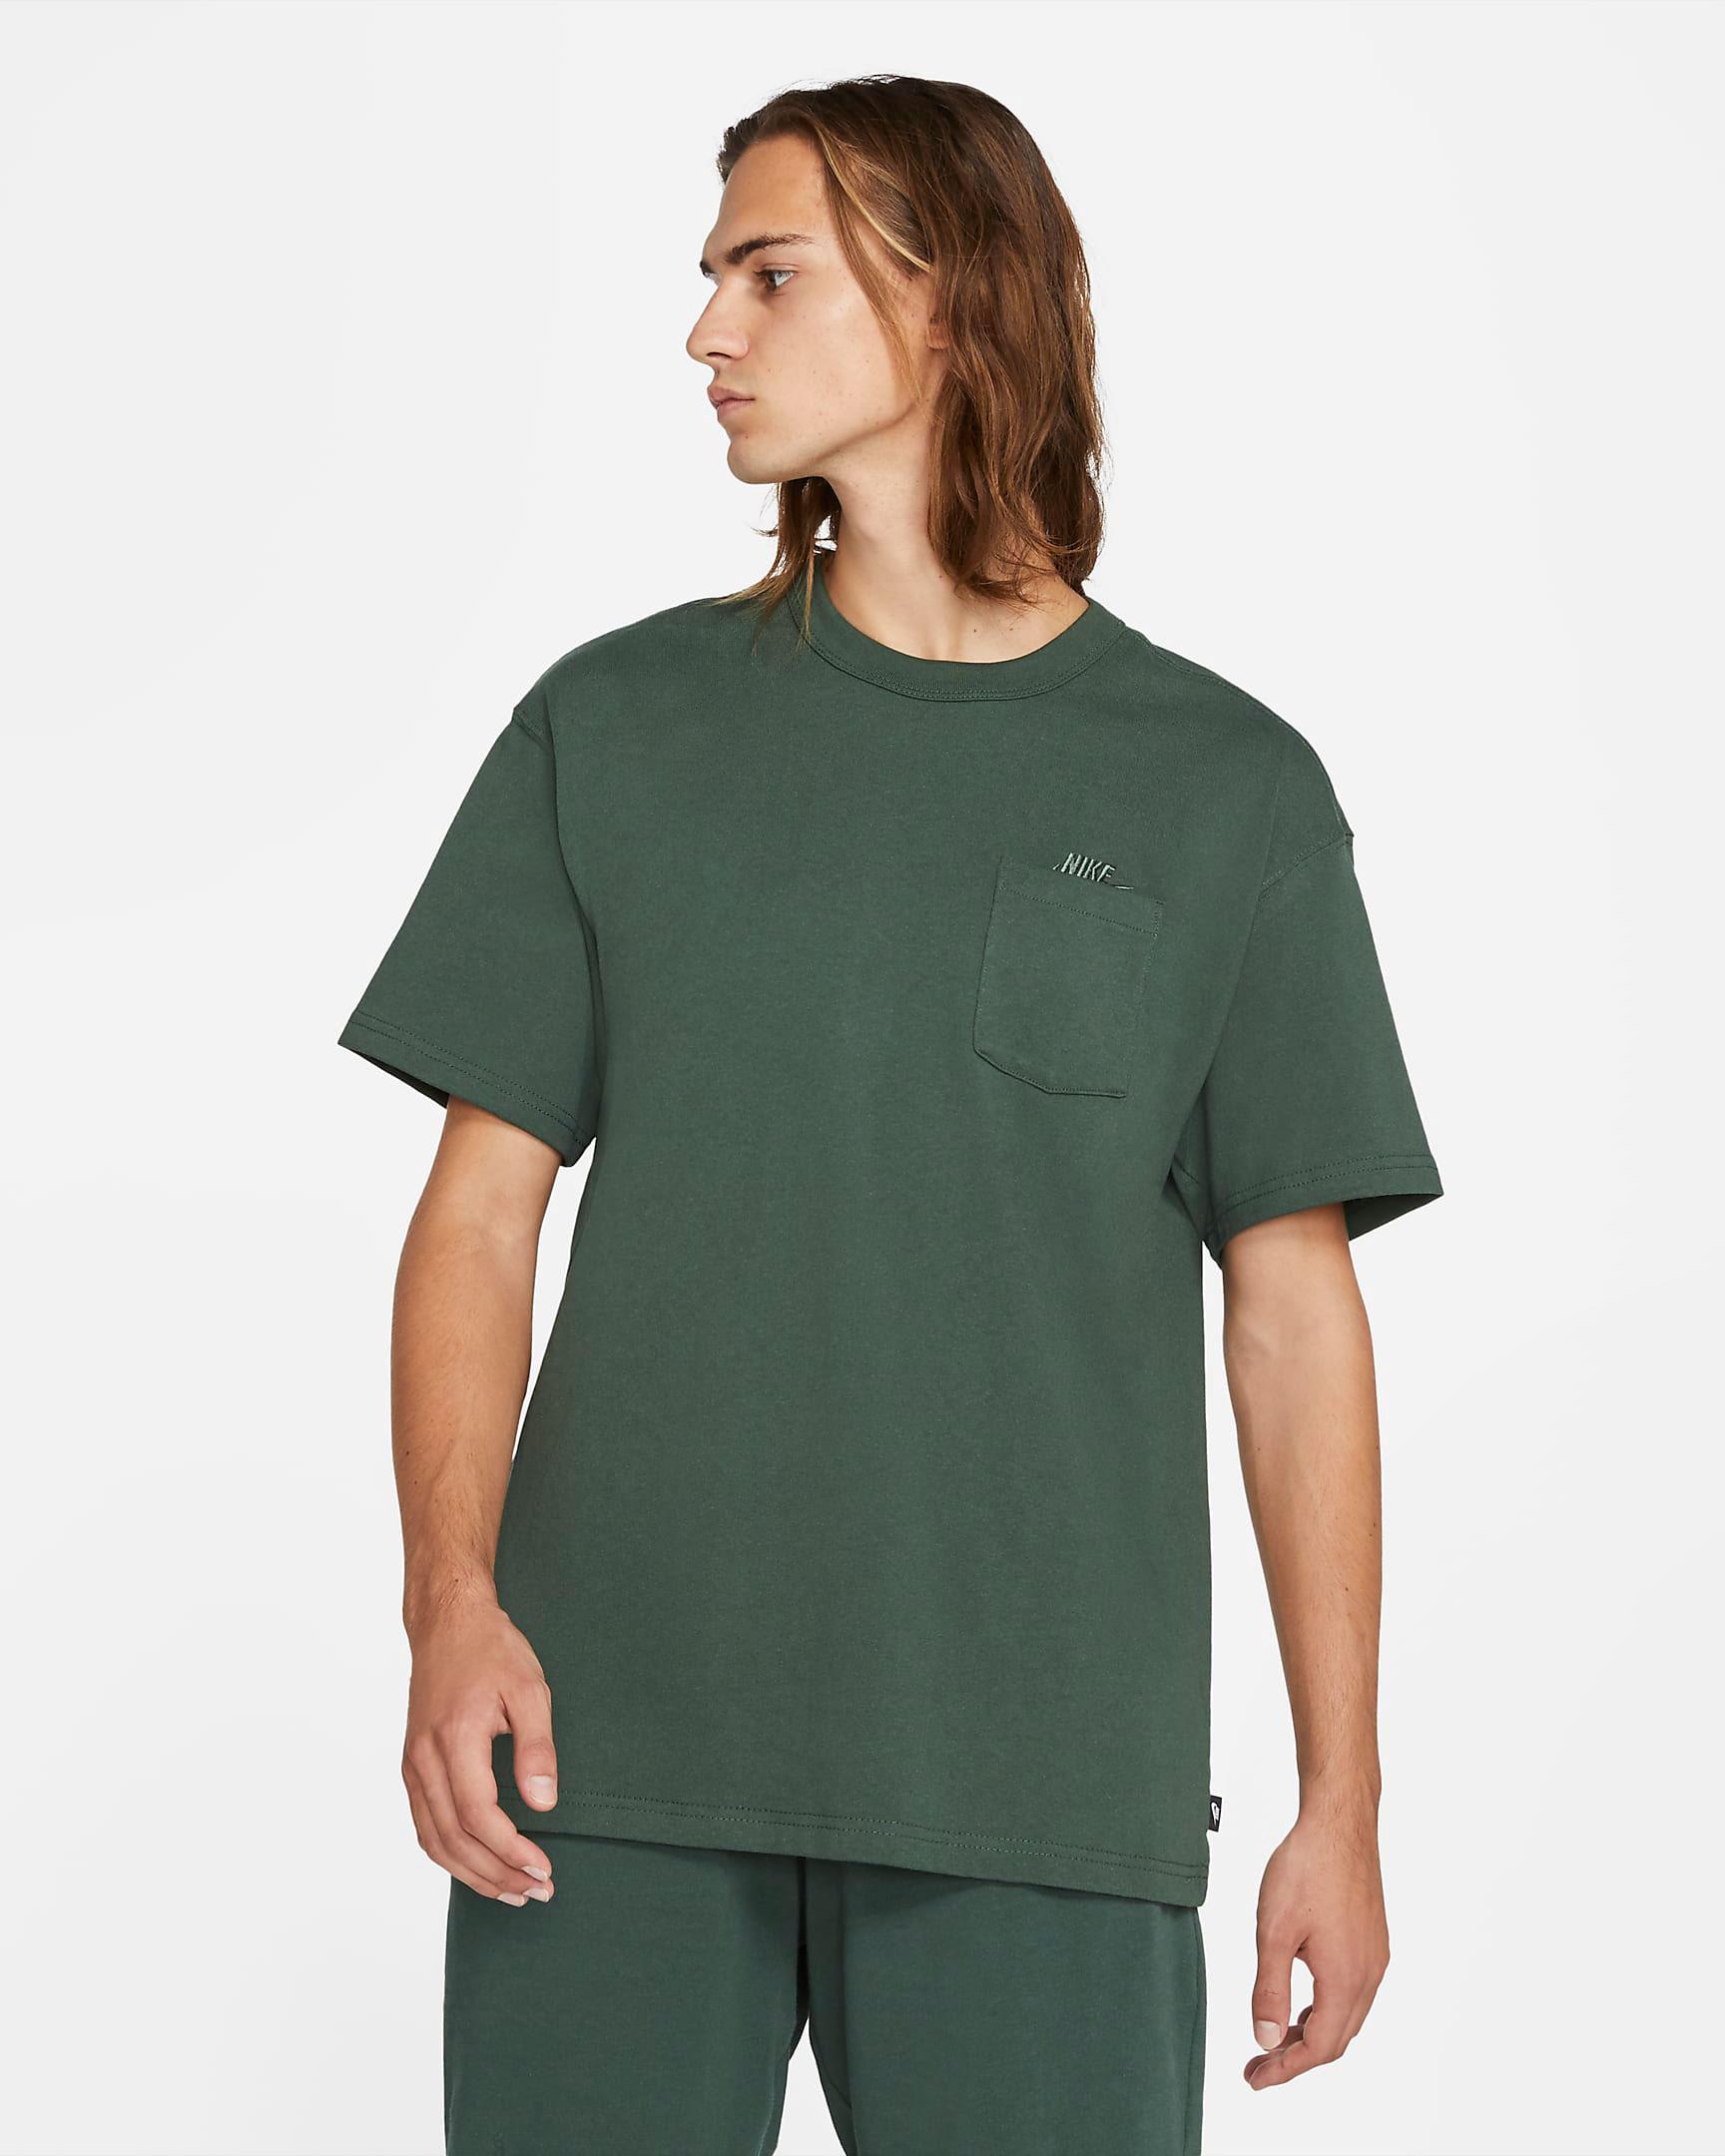 nike-galactic-jade-pocket-t-shirt-1